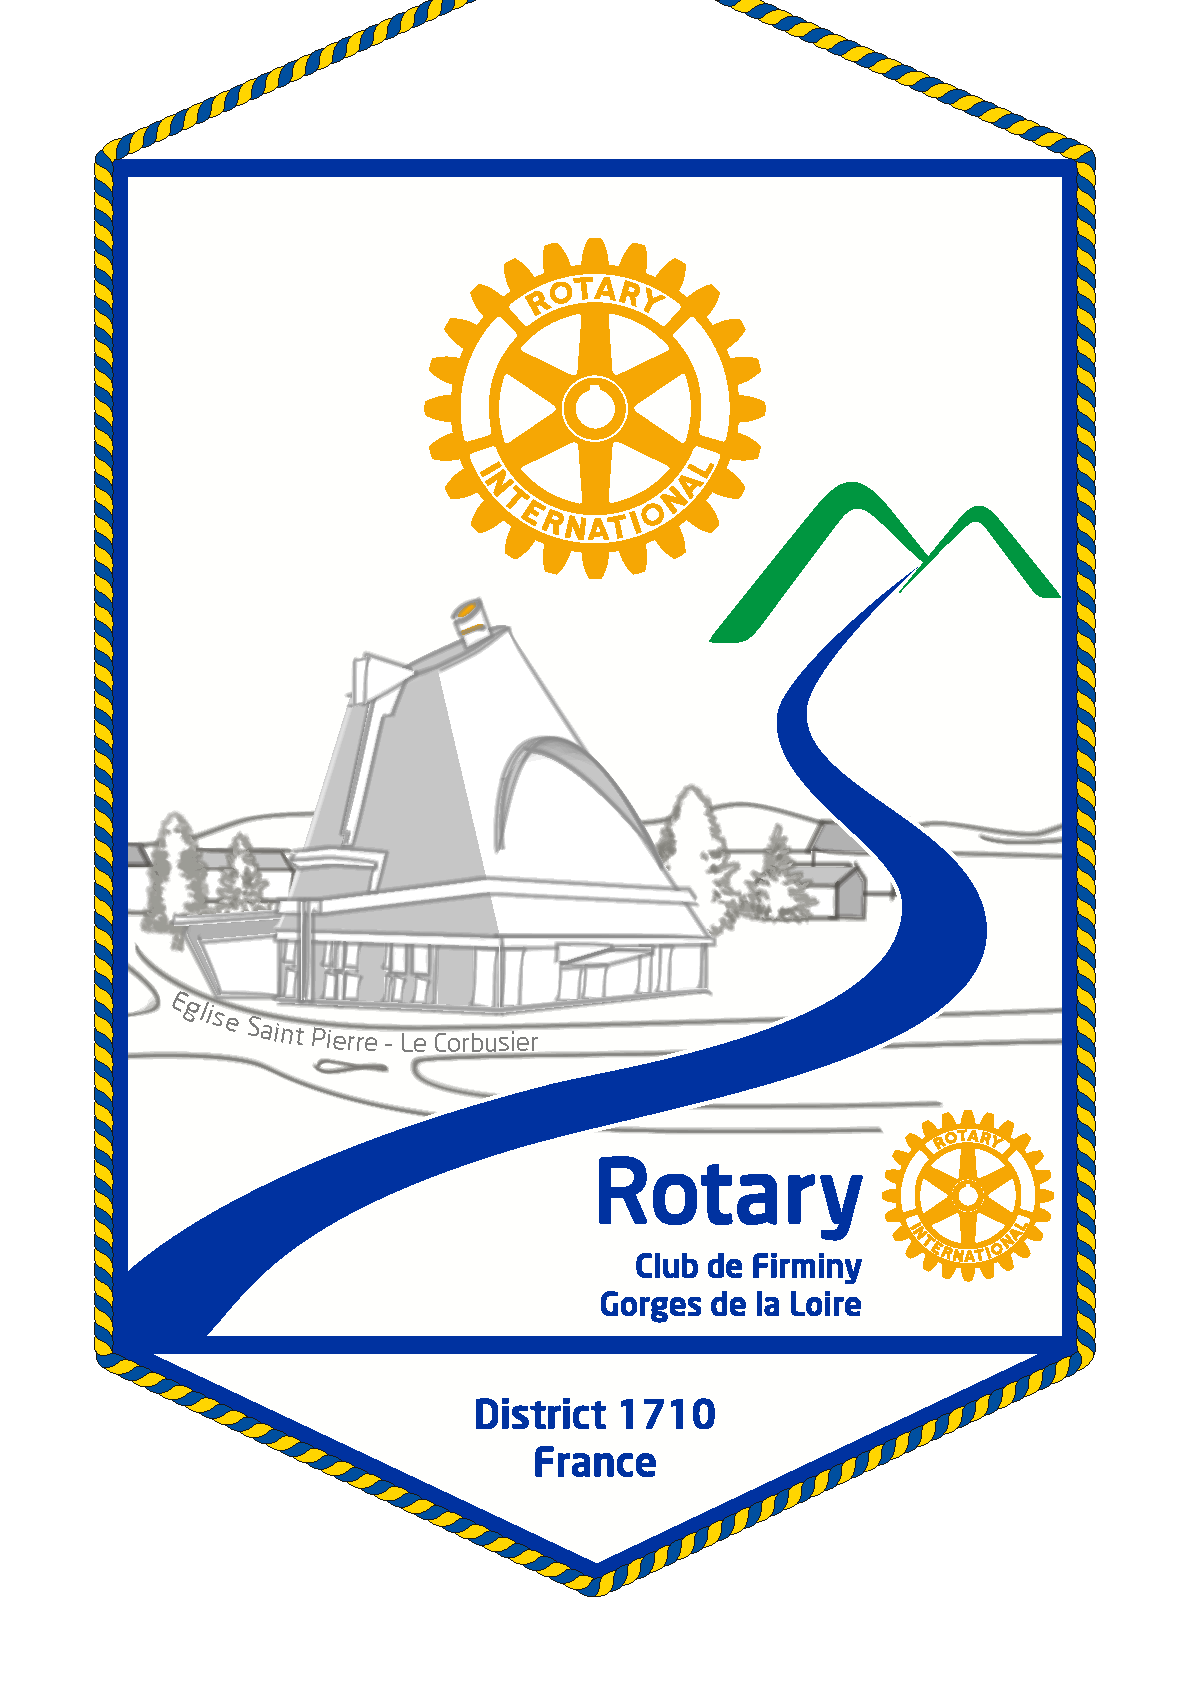 FANION ROTARY CLUB FIRMINY GORGES DE LA LOIRE